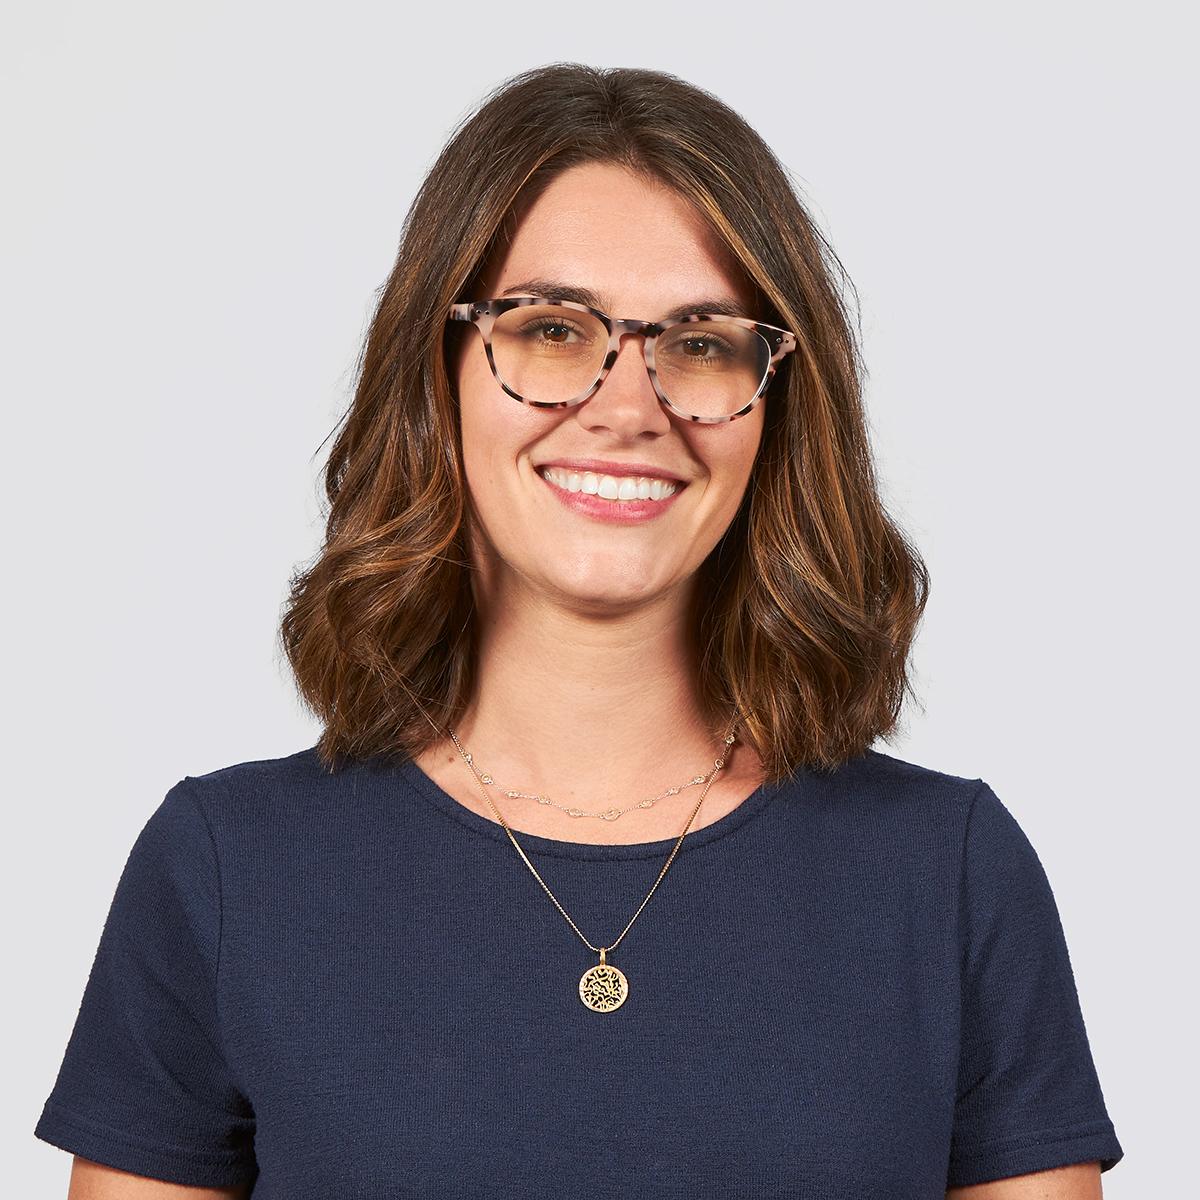 Abby Richman